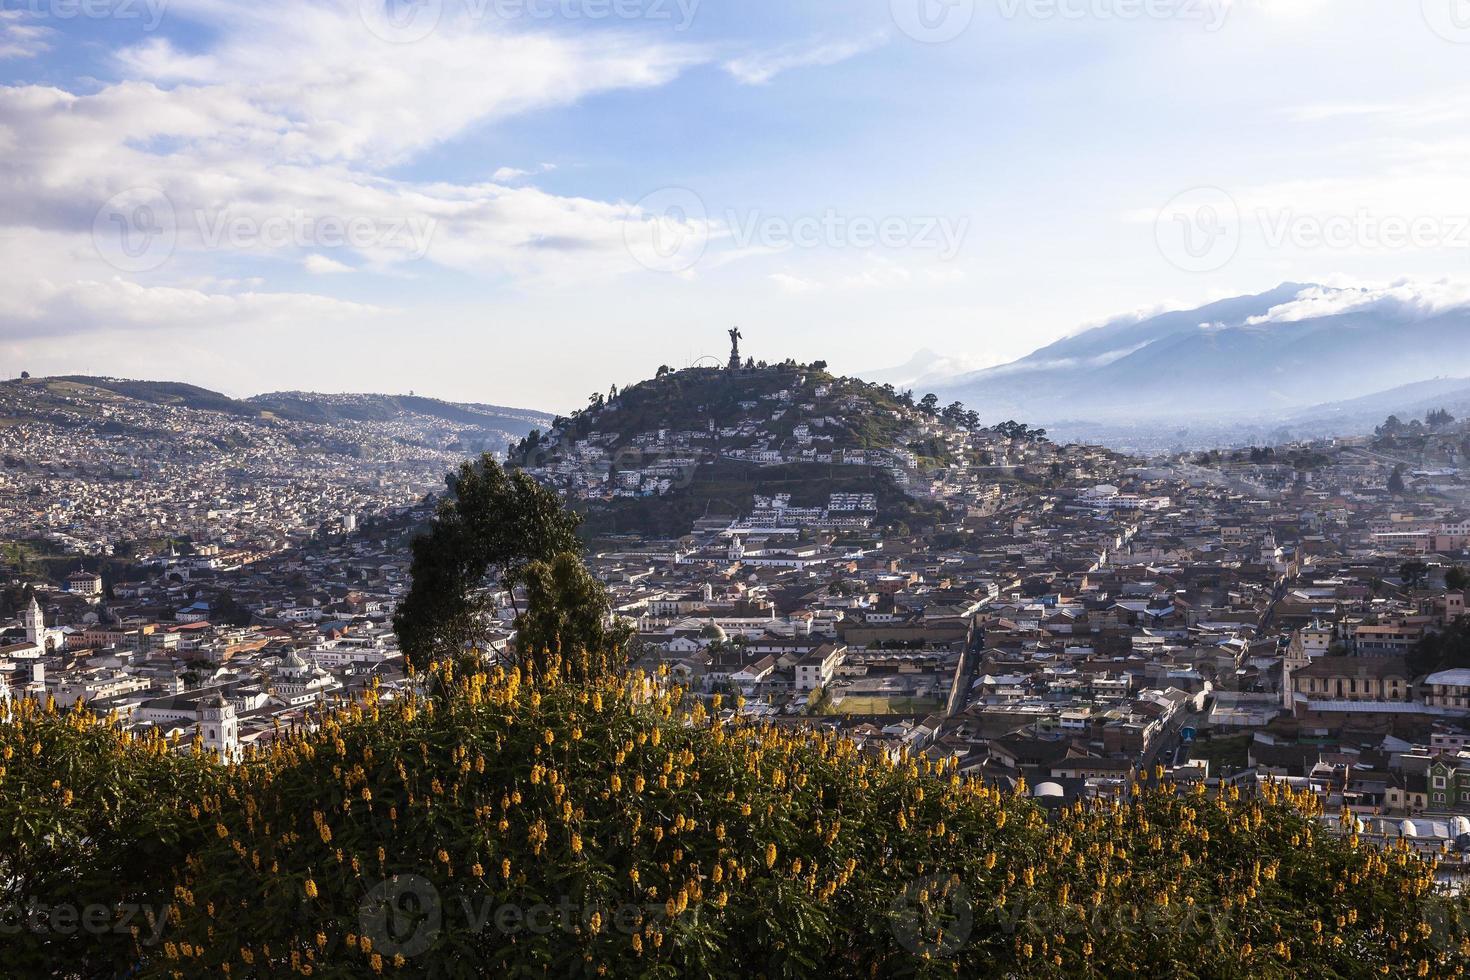 Viewpoint in San Juan, Quito. photo